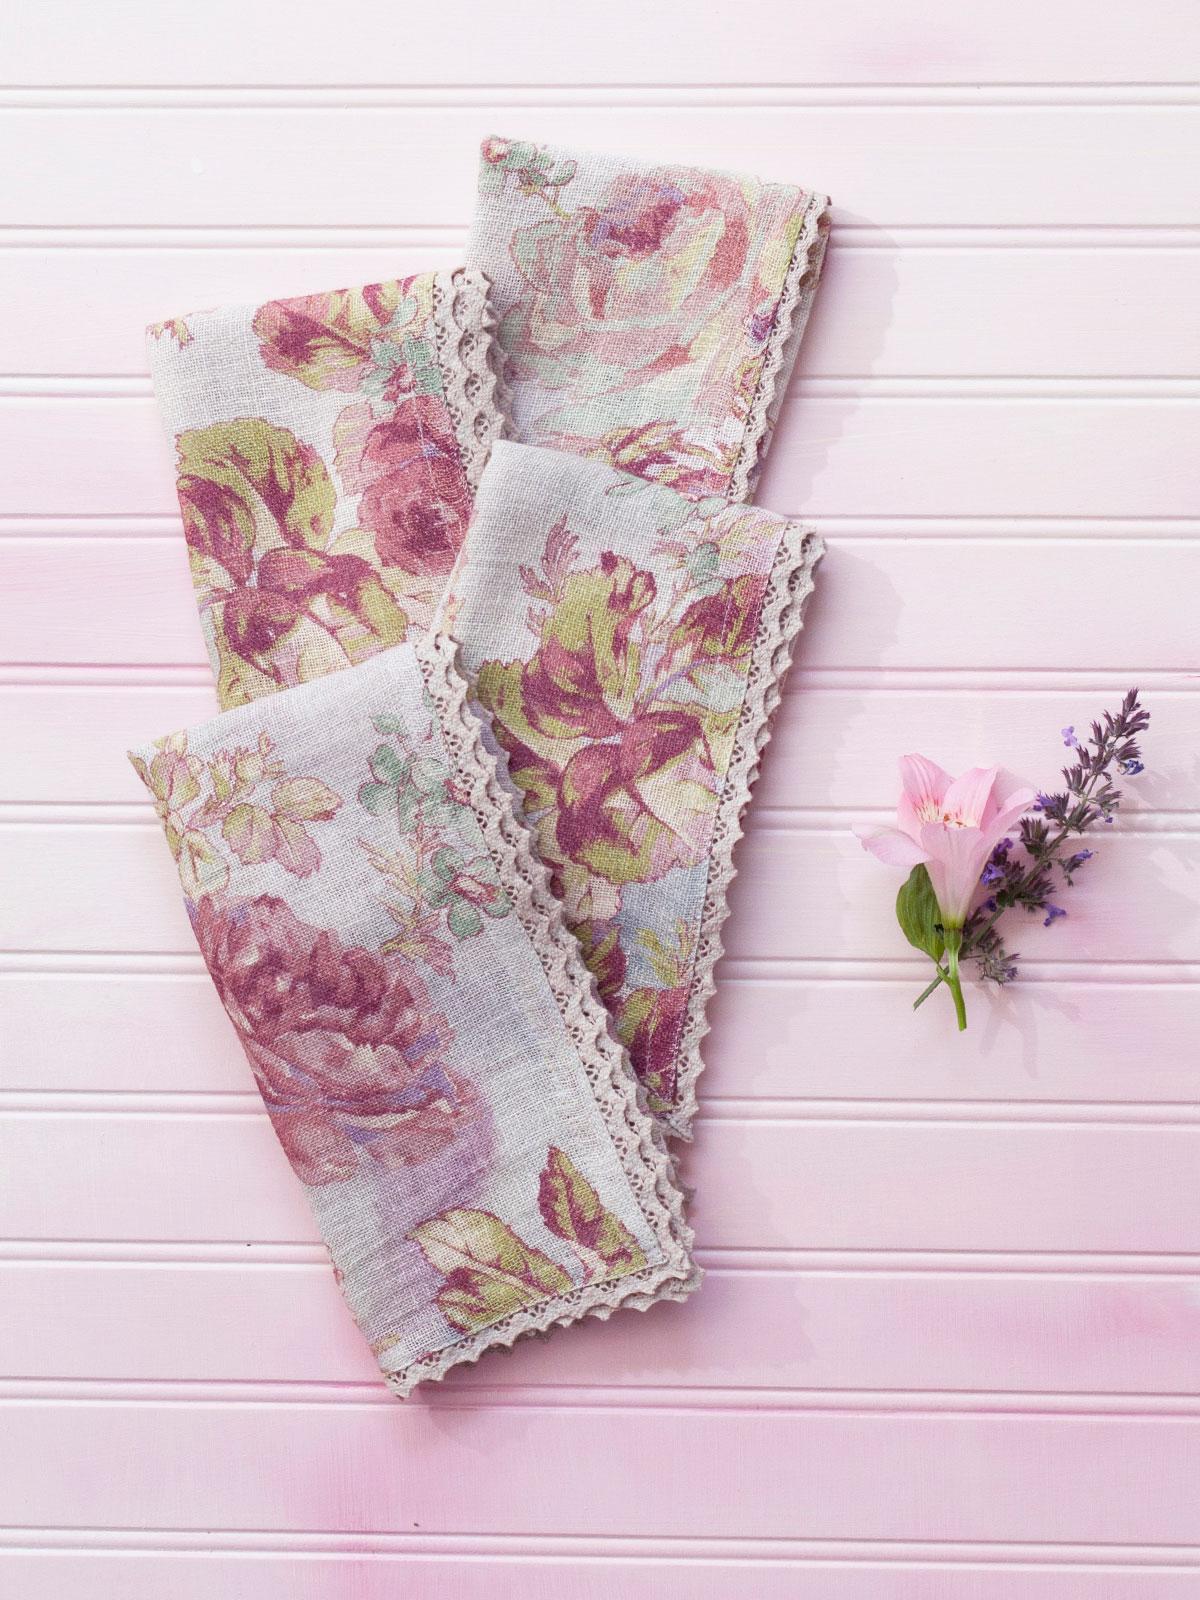 Victorian Rose Linen Napkin Set 4 Kitchen Table Linens Napkins Beautiful Designs By April Cornell